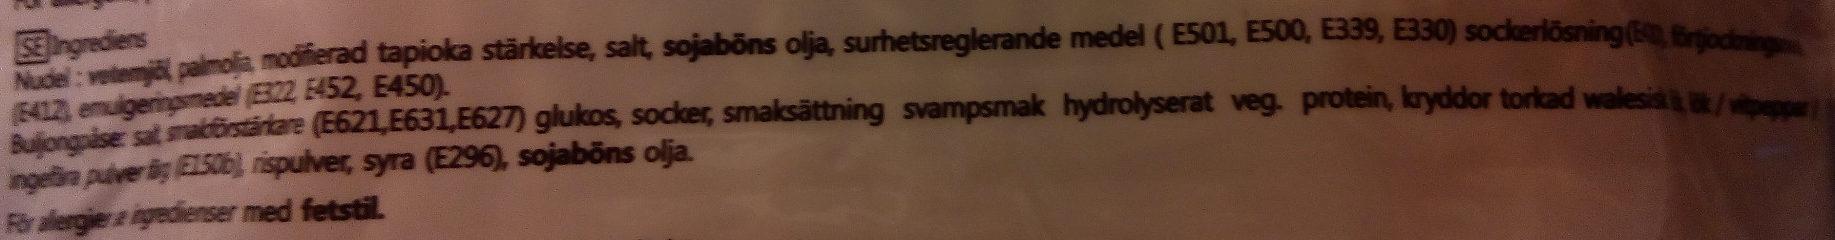 Samyang Ramen Champinjon smak - Ingrediënten - sv